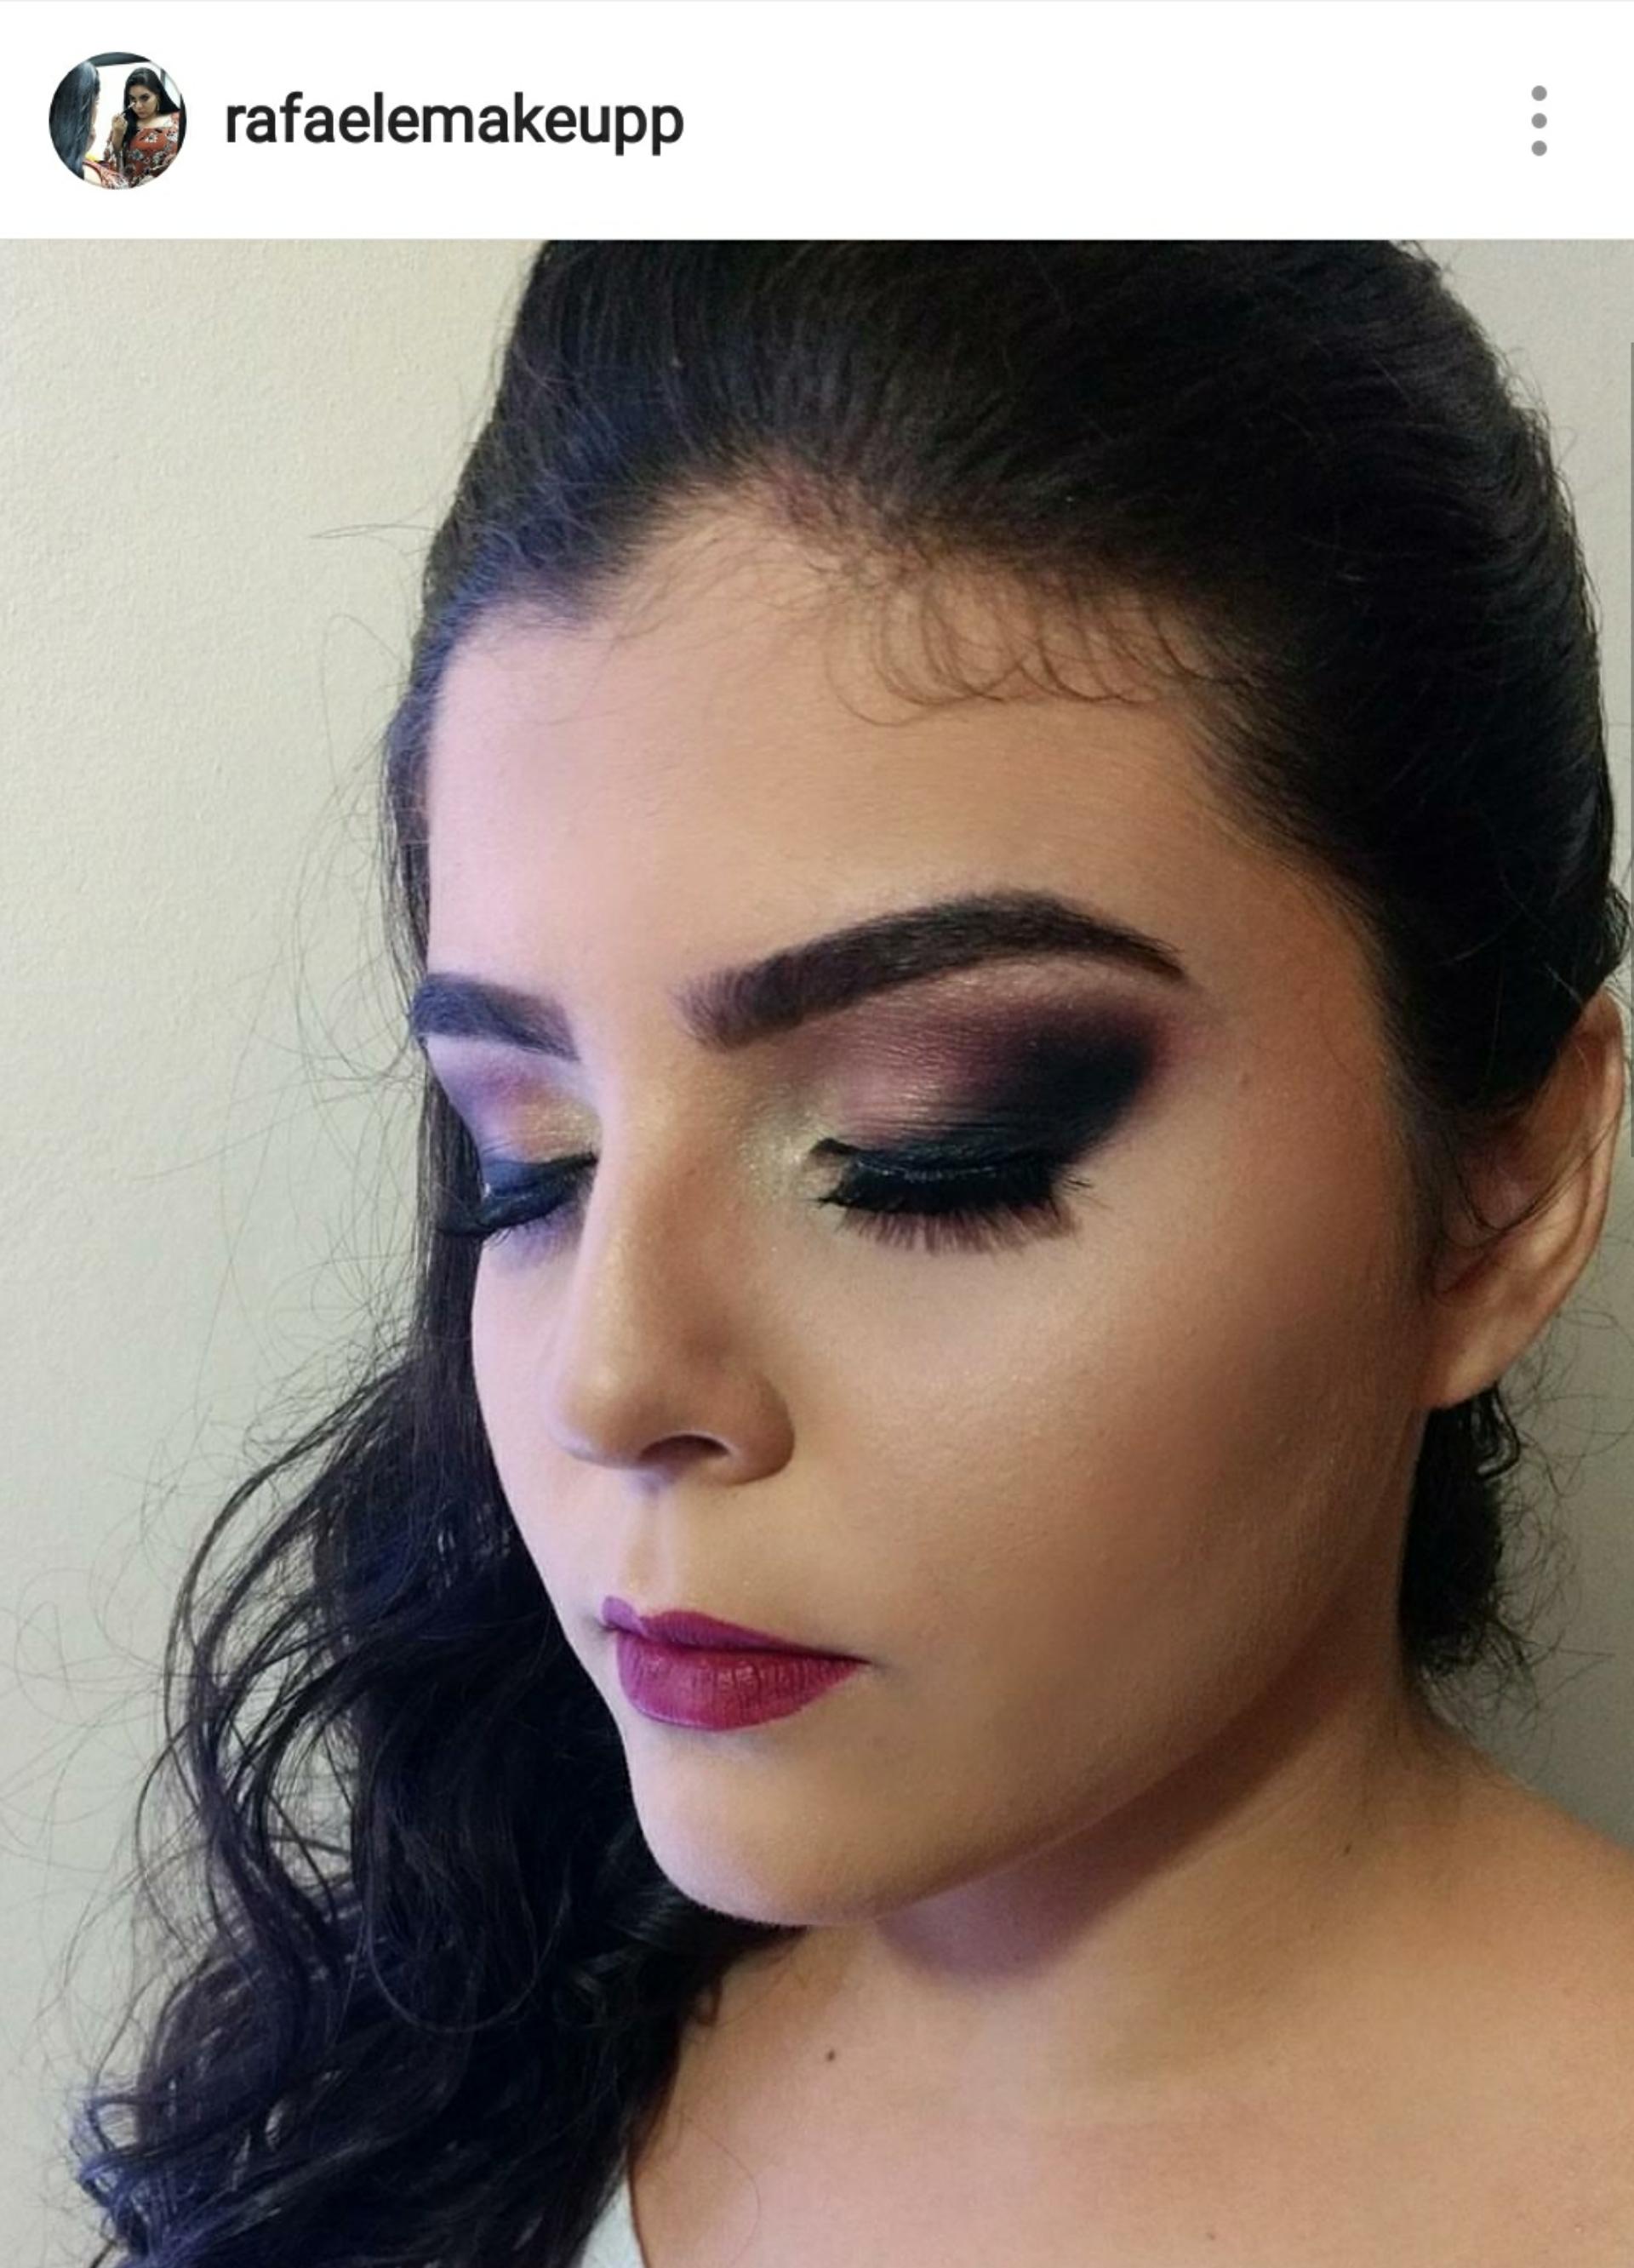 Maquiagem de debutante. #maquiagem #debutante #maquiagemprofissional #maquiadora  maquiagem maquiador(a)